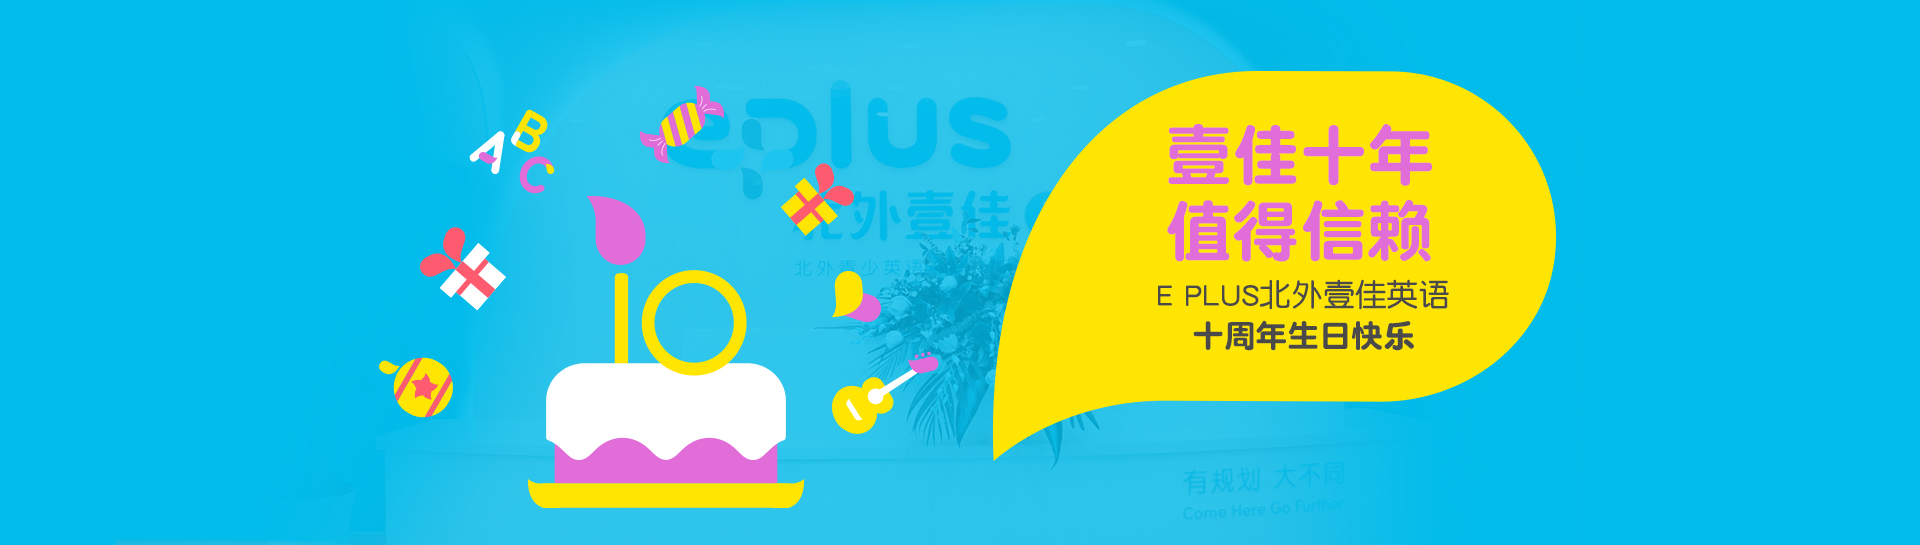 E PLUS雷火电竞官方app下载壹佳英语十周年生日快乐